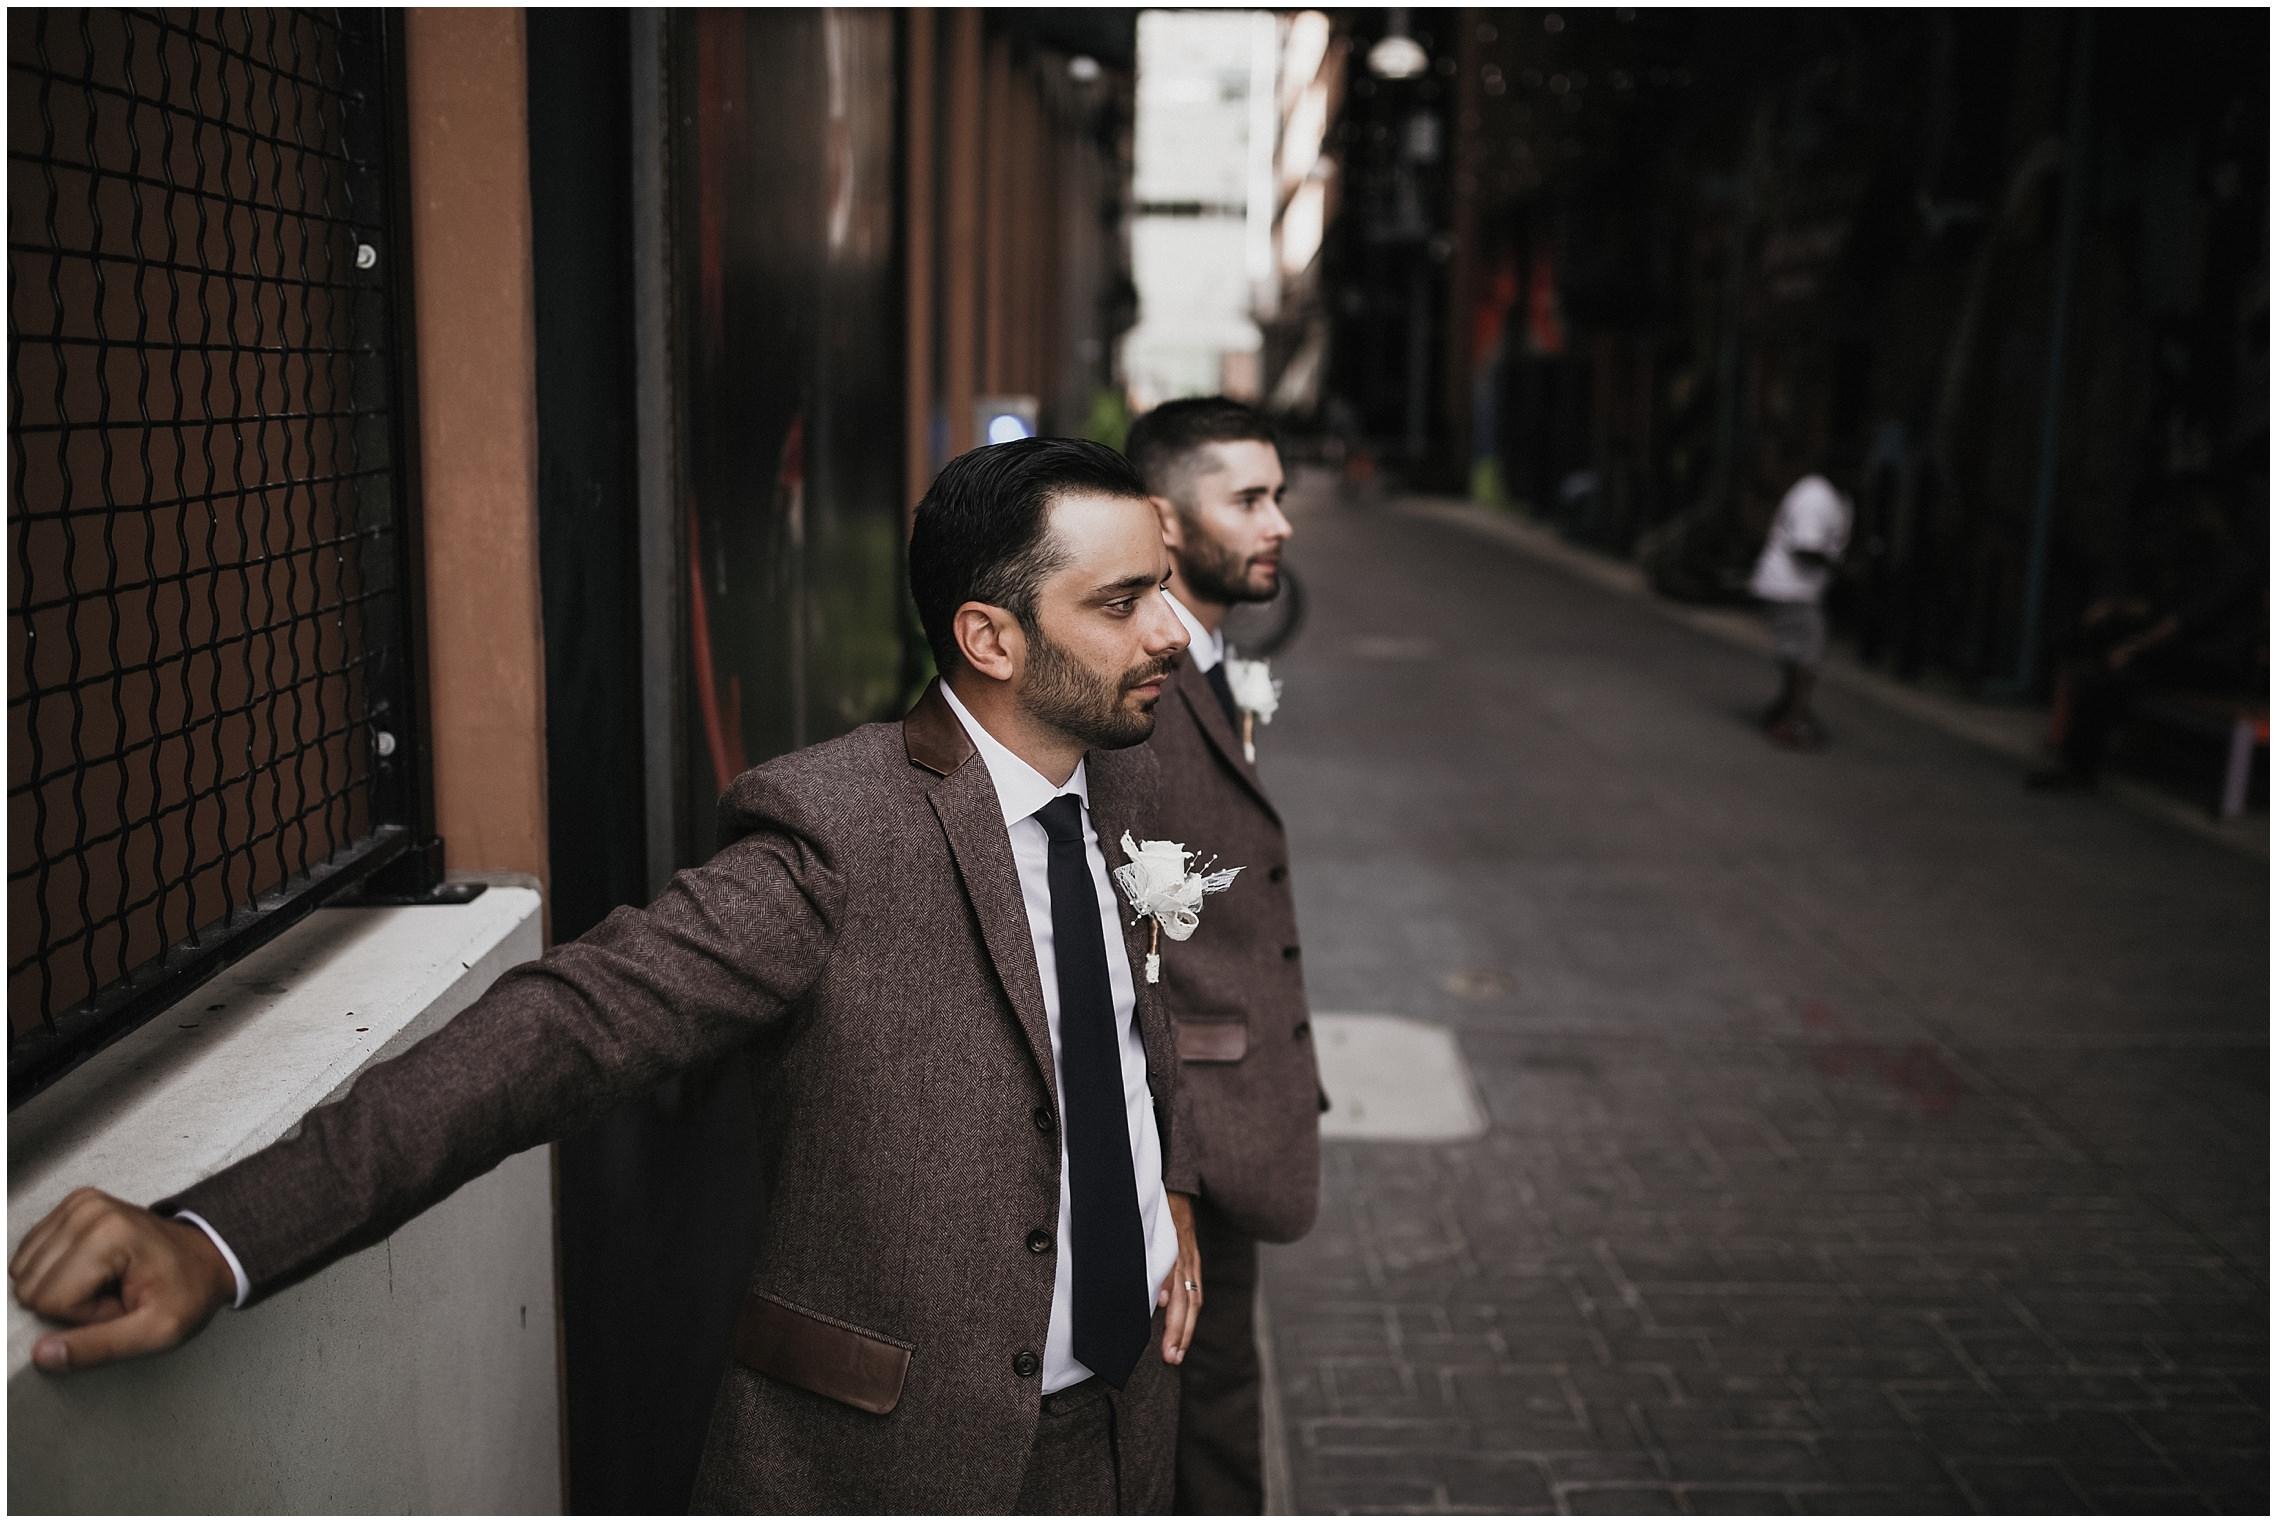 brick_and_mortar_colorado_wedding_photographer_0236.jpg